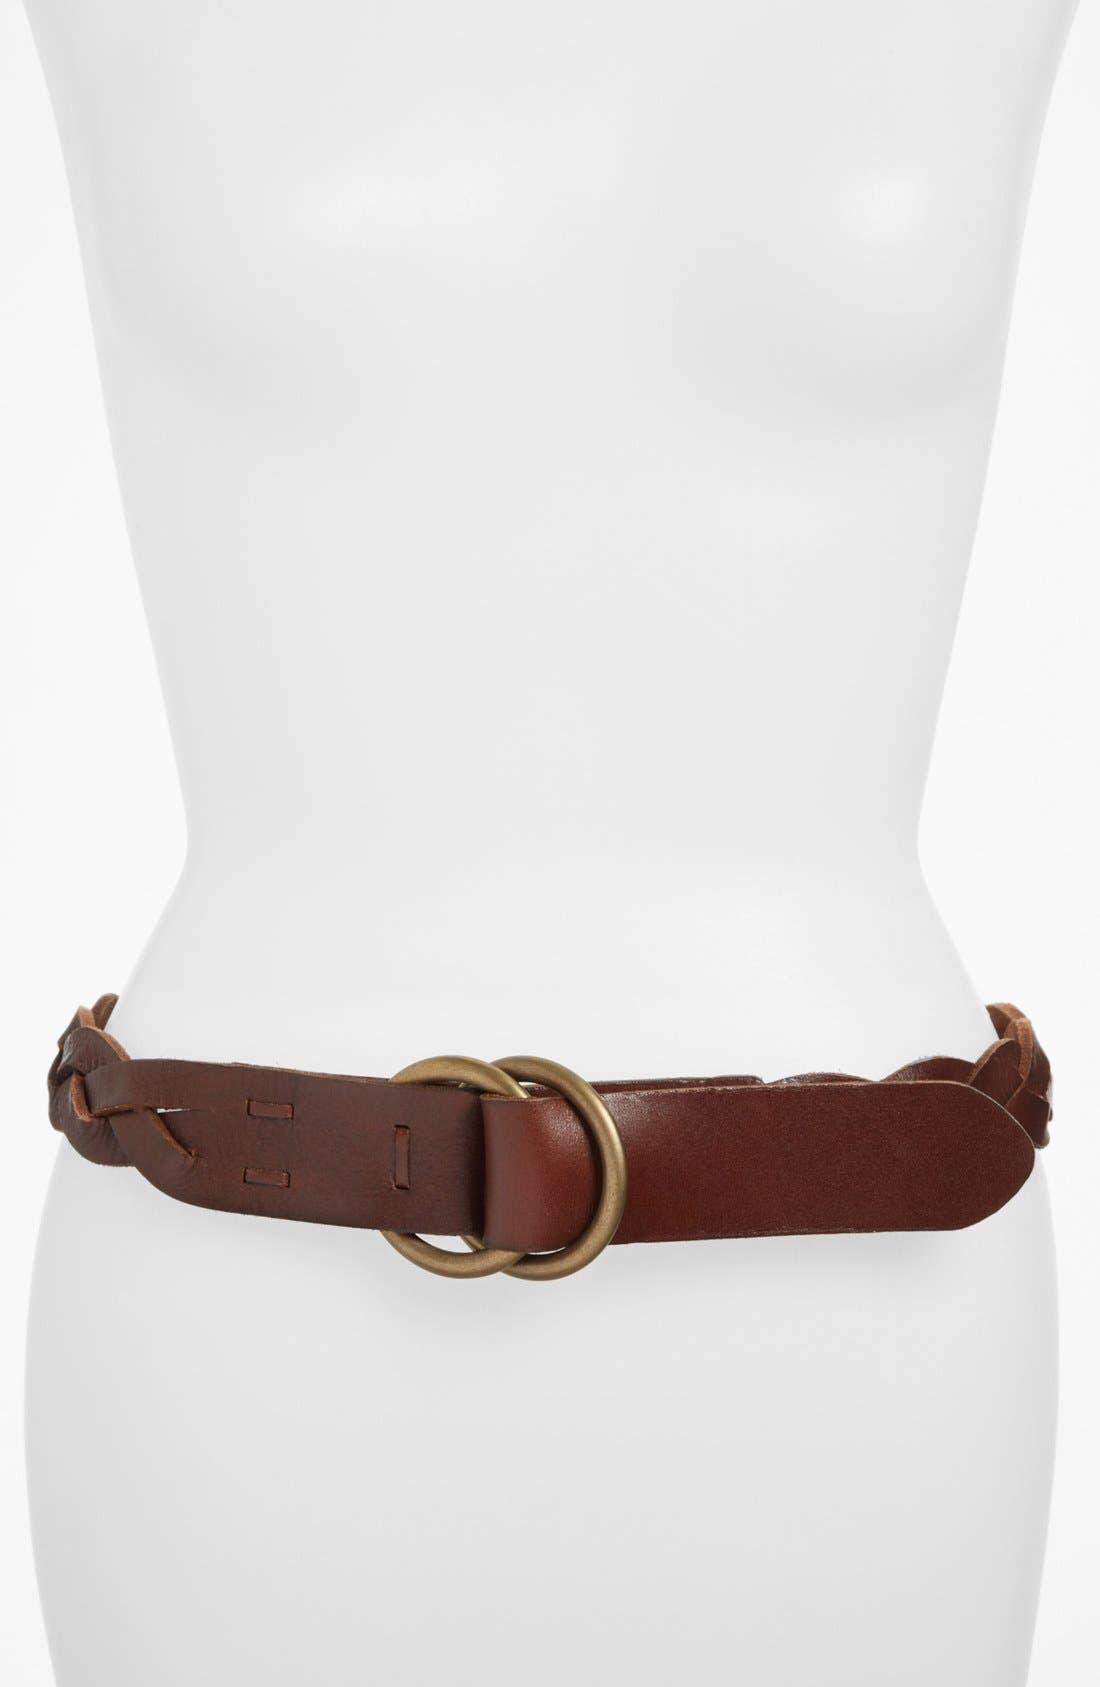 Main Image - Lauren Ralph Lauren 'Miracle Braid' Leather Belt